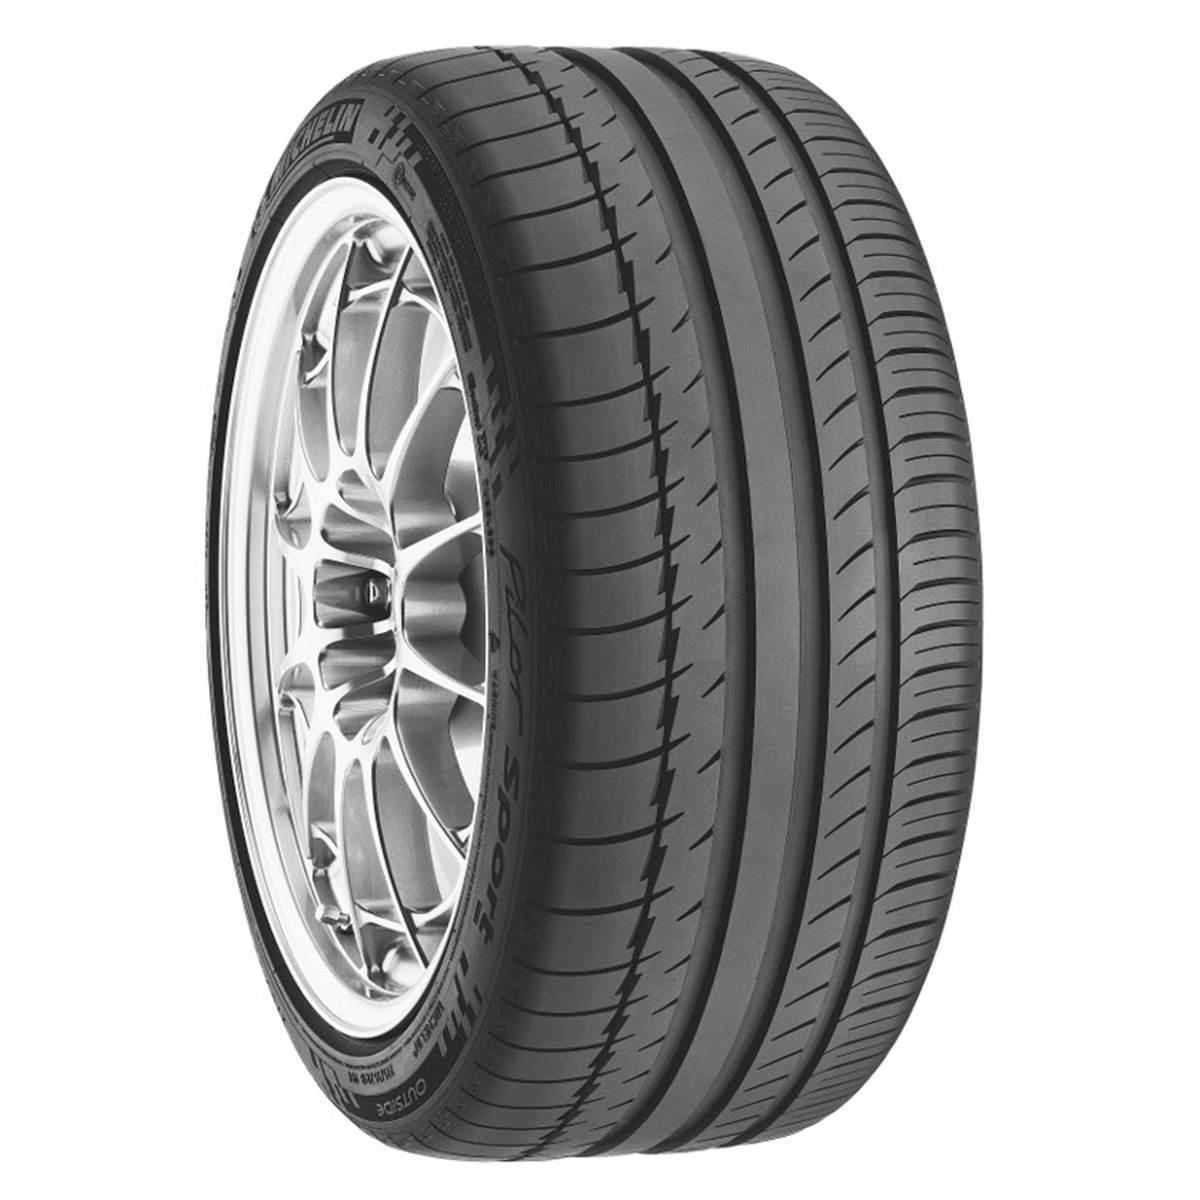 Pneu Michelin 225/35R19 88Y Pilot Sport Ps2 XL